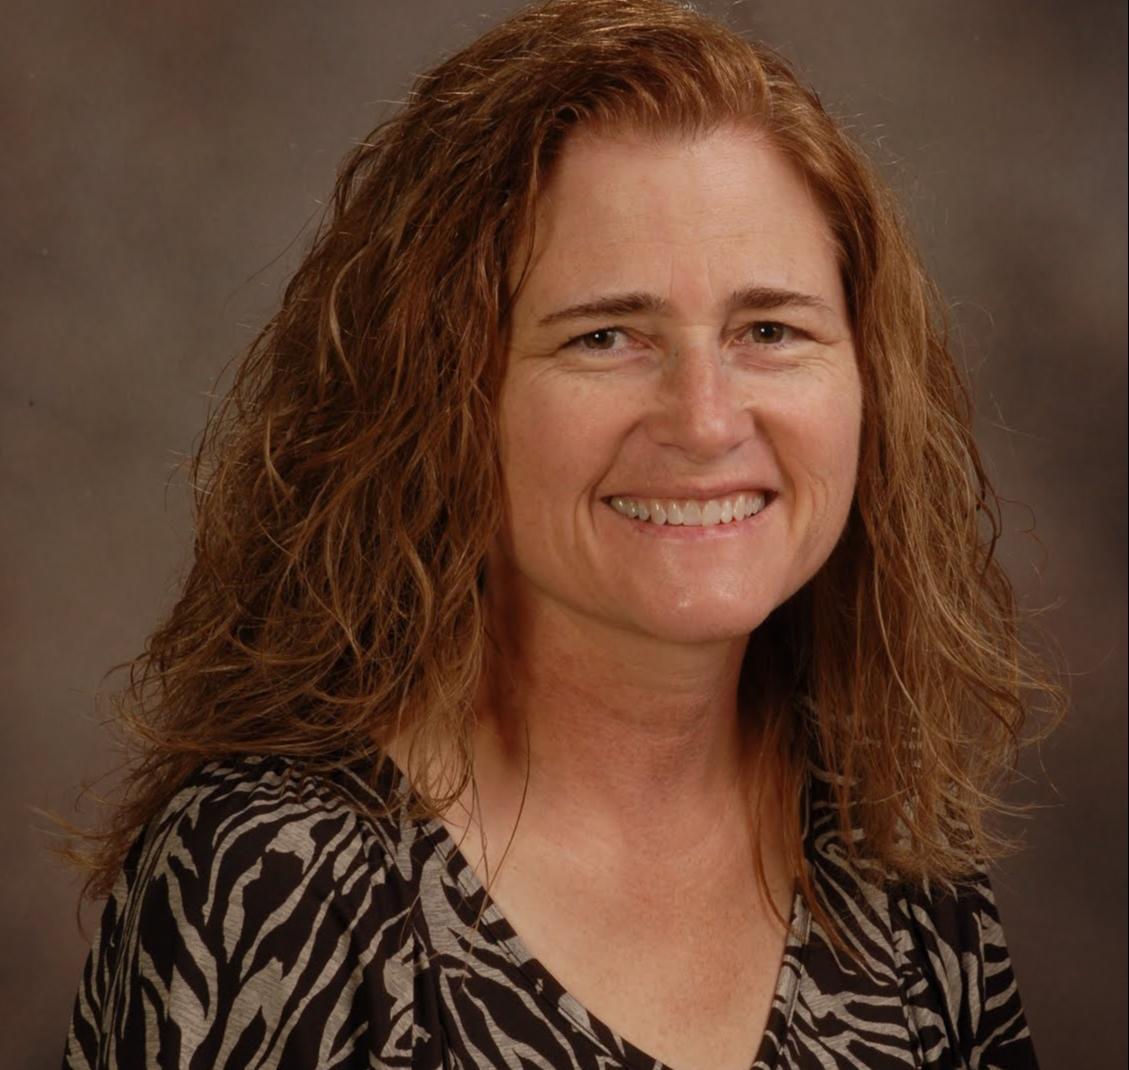 A photo of Debra Ryan